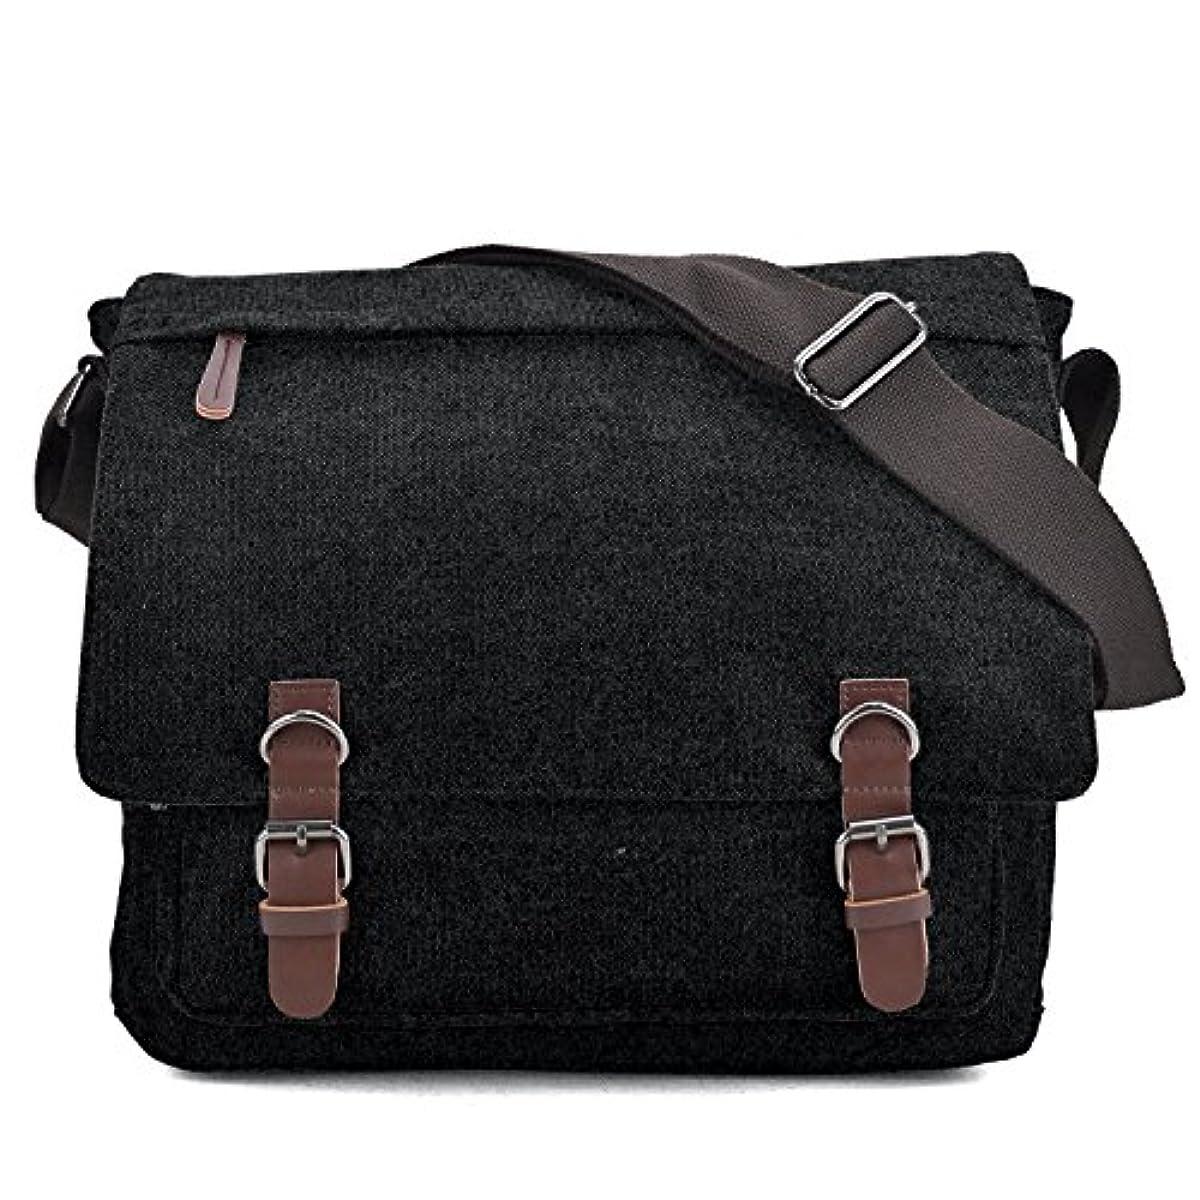 08d0a3e5cba7 Details about Large Vintage Canvas Messenger Shoulder Bag Causal Crossbody  Bookbag Computer La